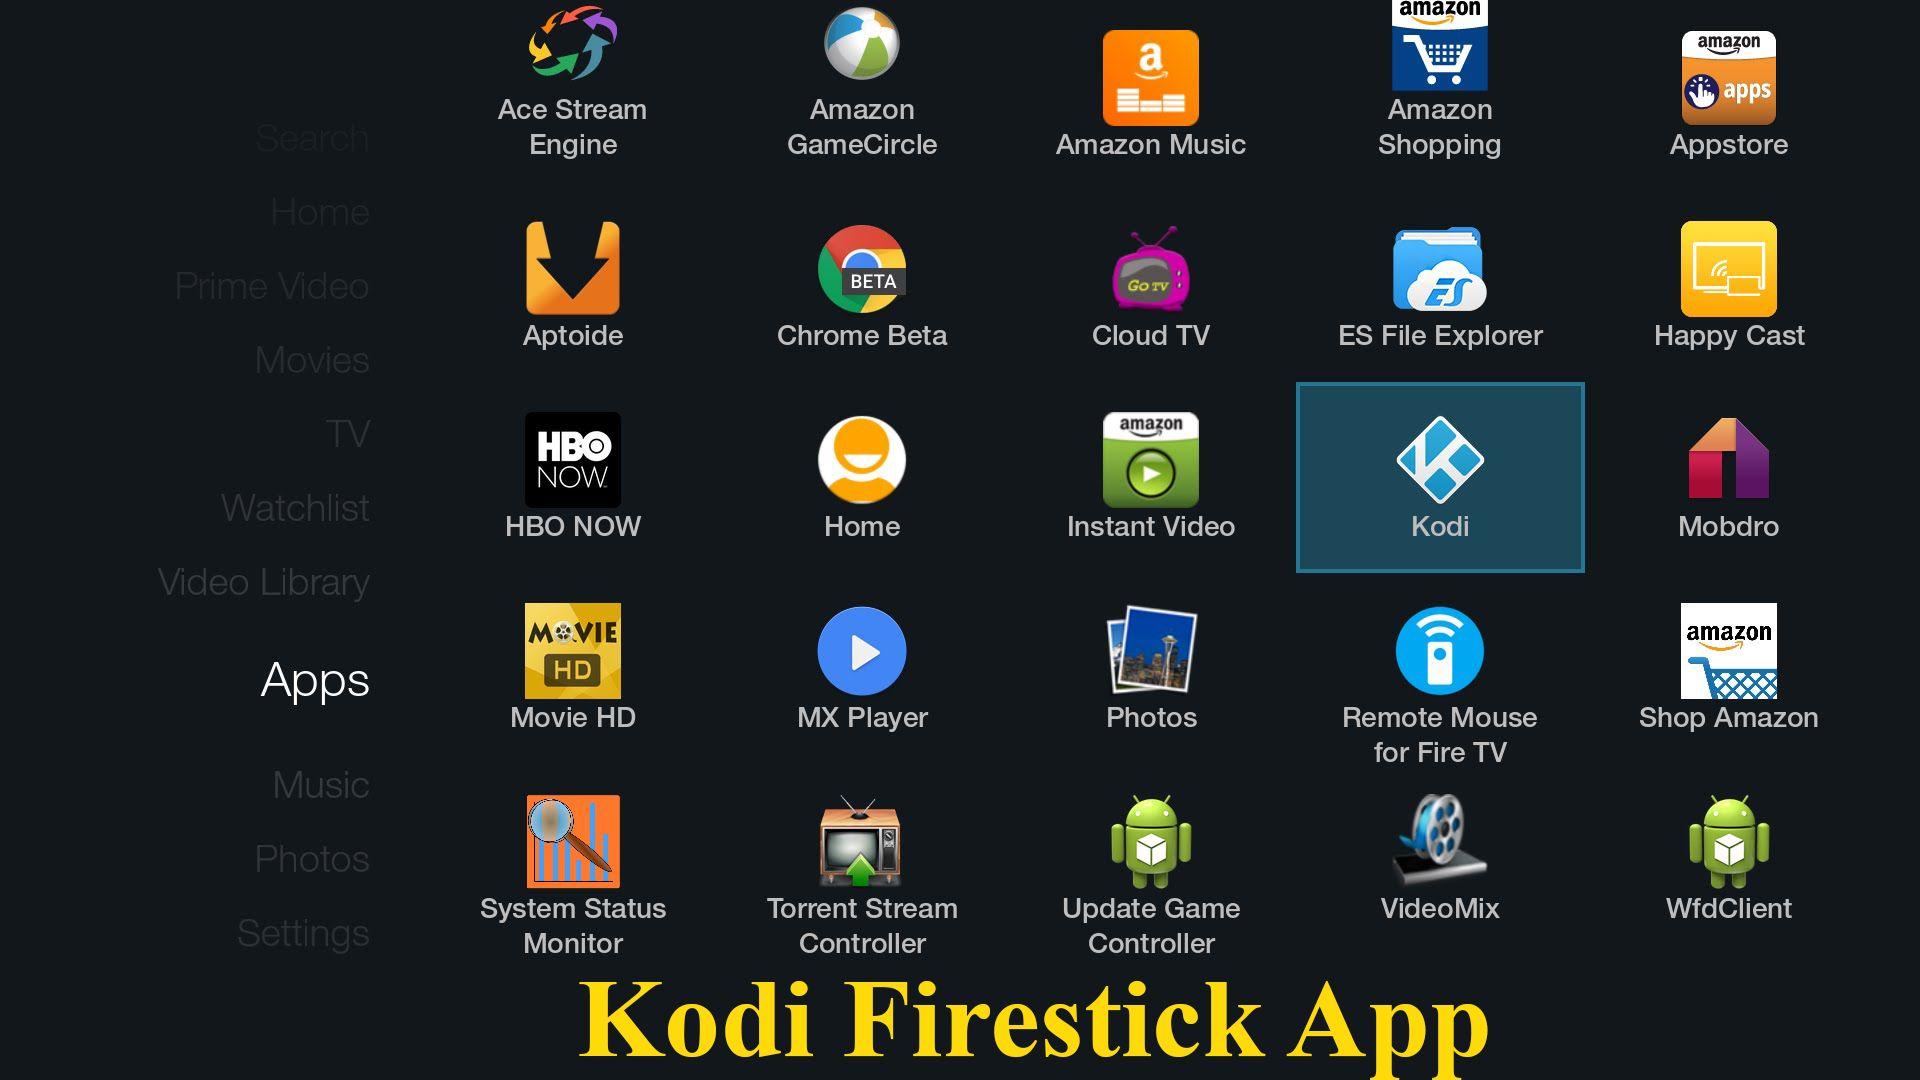 Kodi firestick app is a powerful software that provides